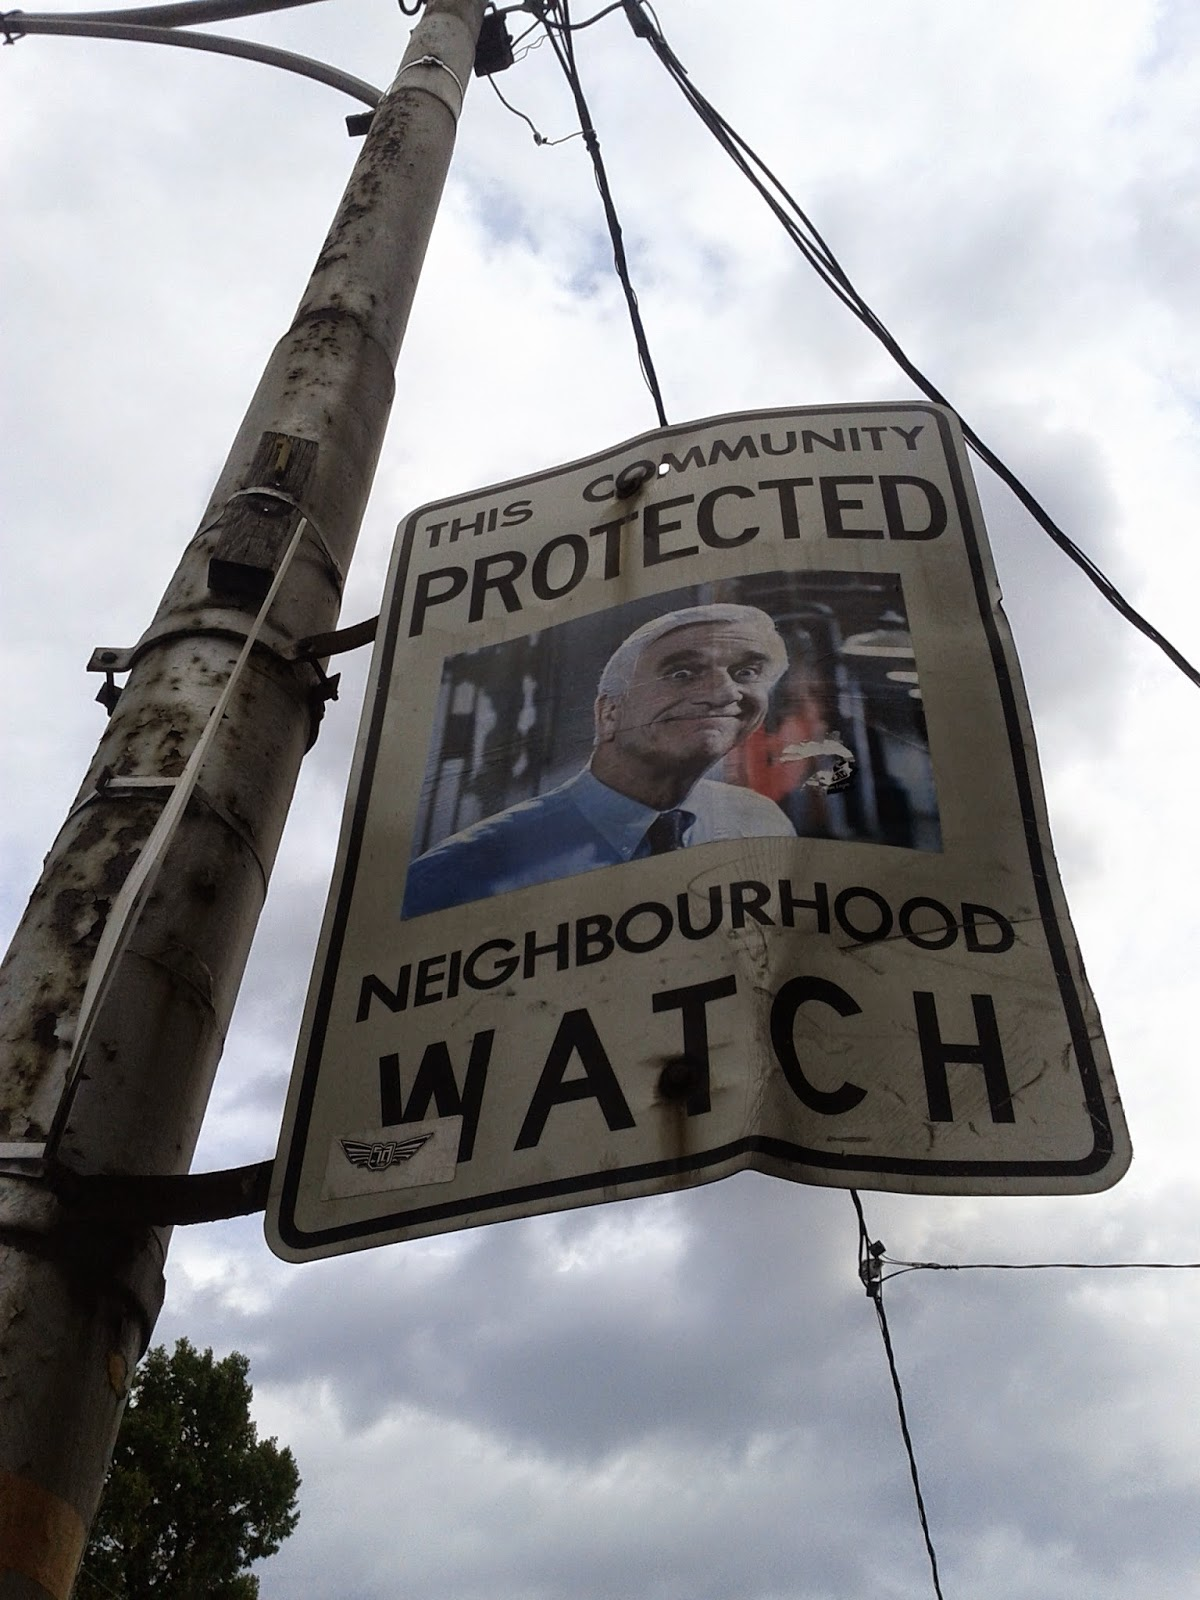 Neighbourhod Watch, Leslie Nielsen